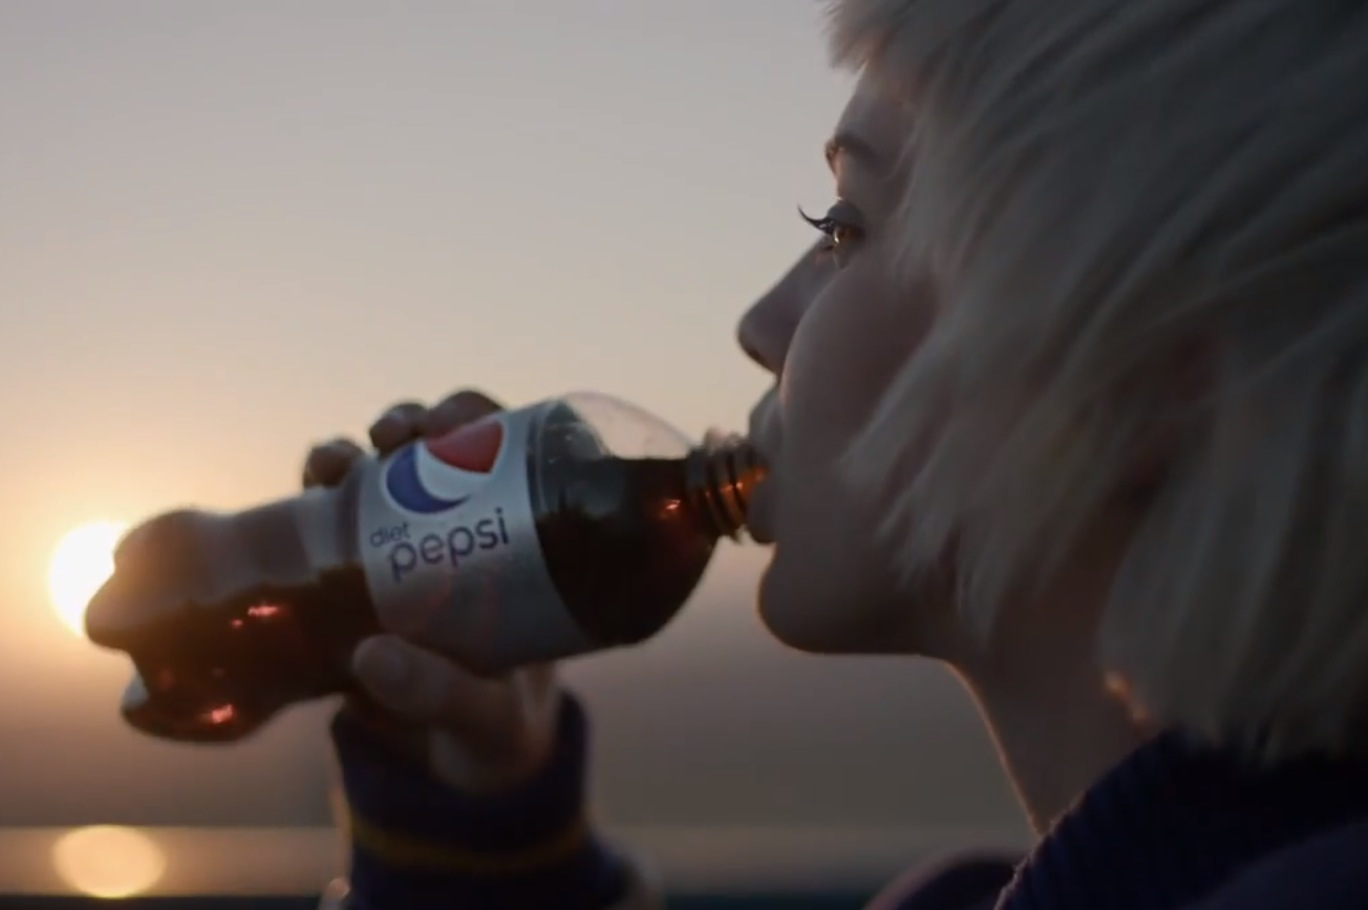 Pepsi #FanEnough